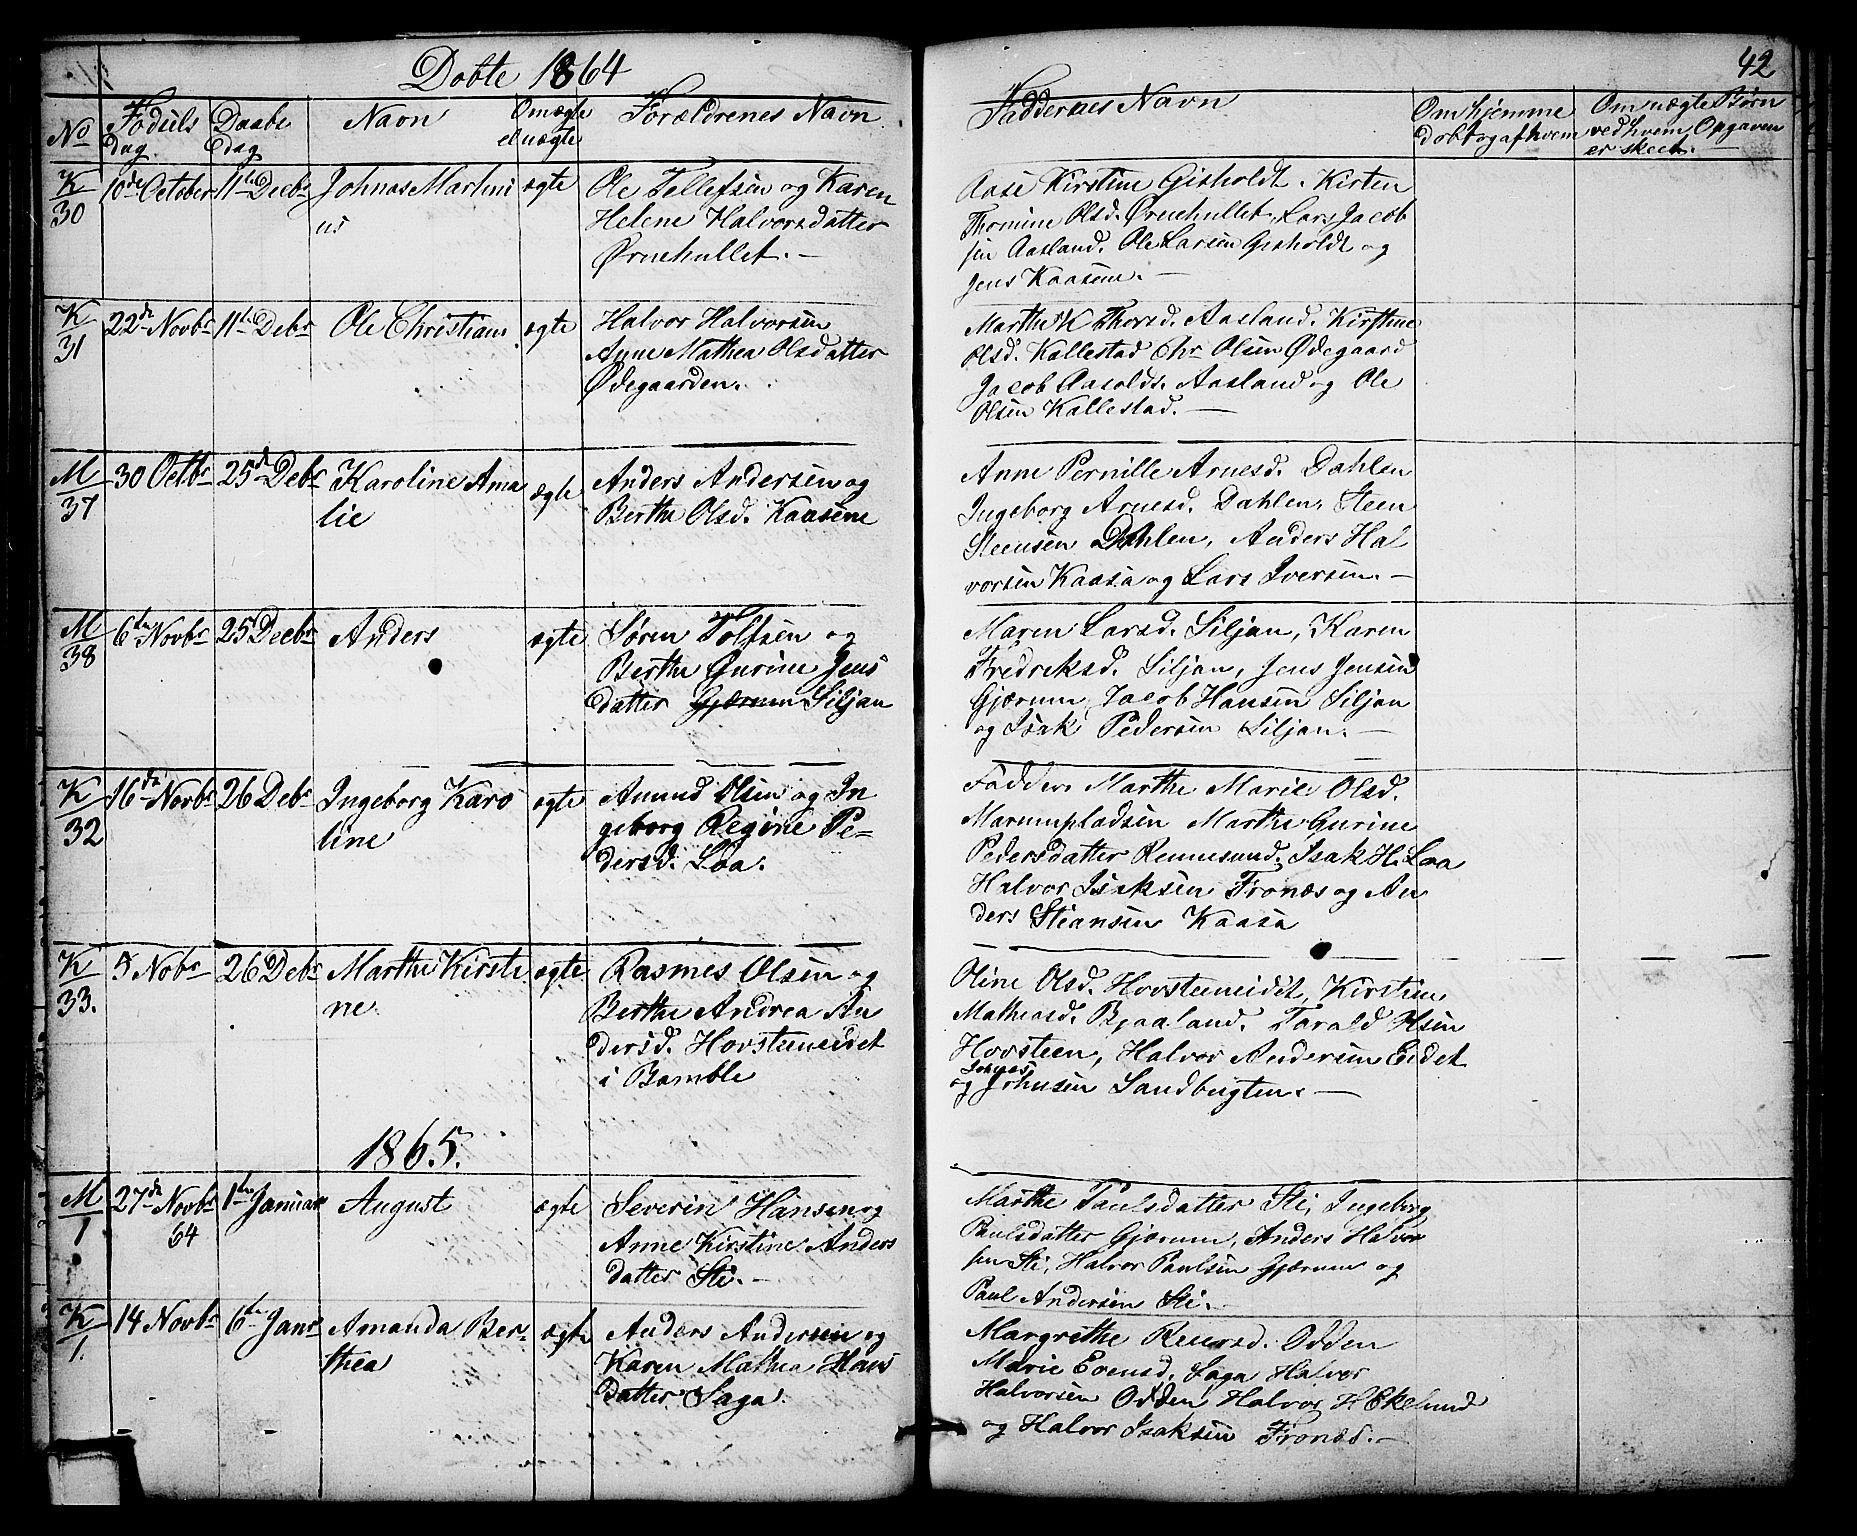 SAKO, Solum kirkebøker, G/Gb/L0002: Klokkerbok nr. II 2, 1859-1879, s. 42